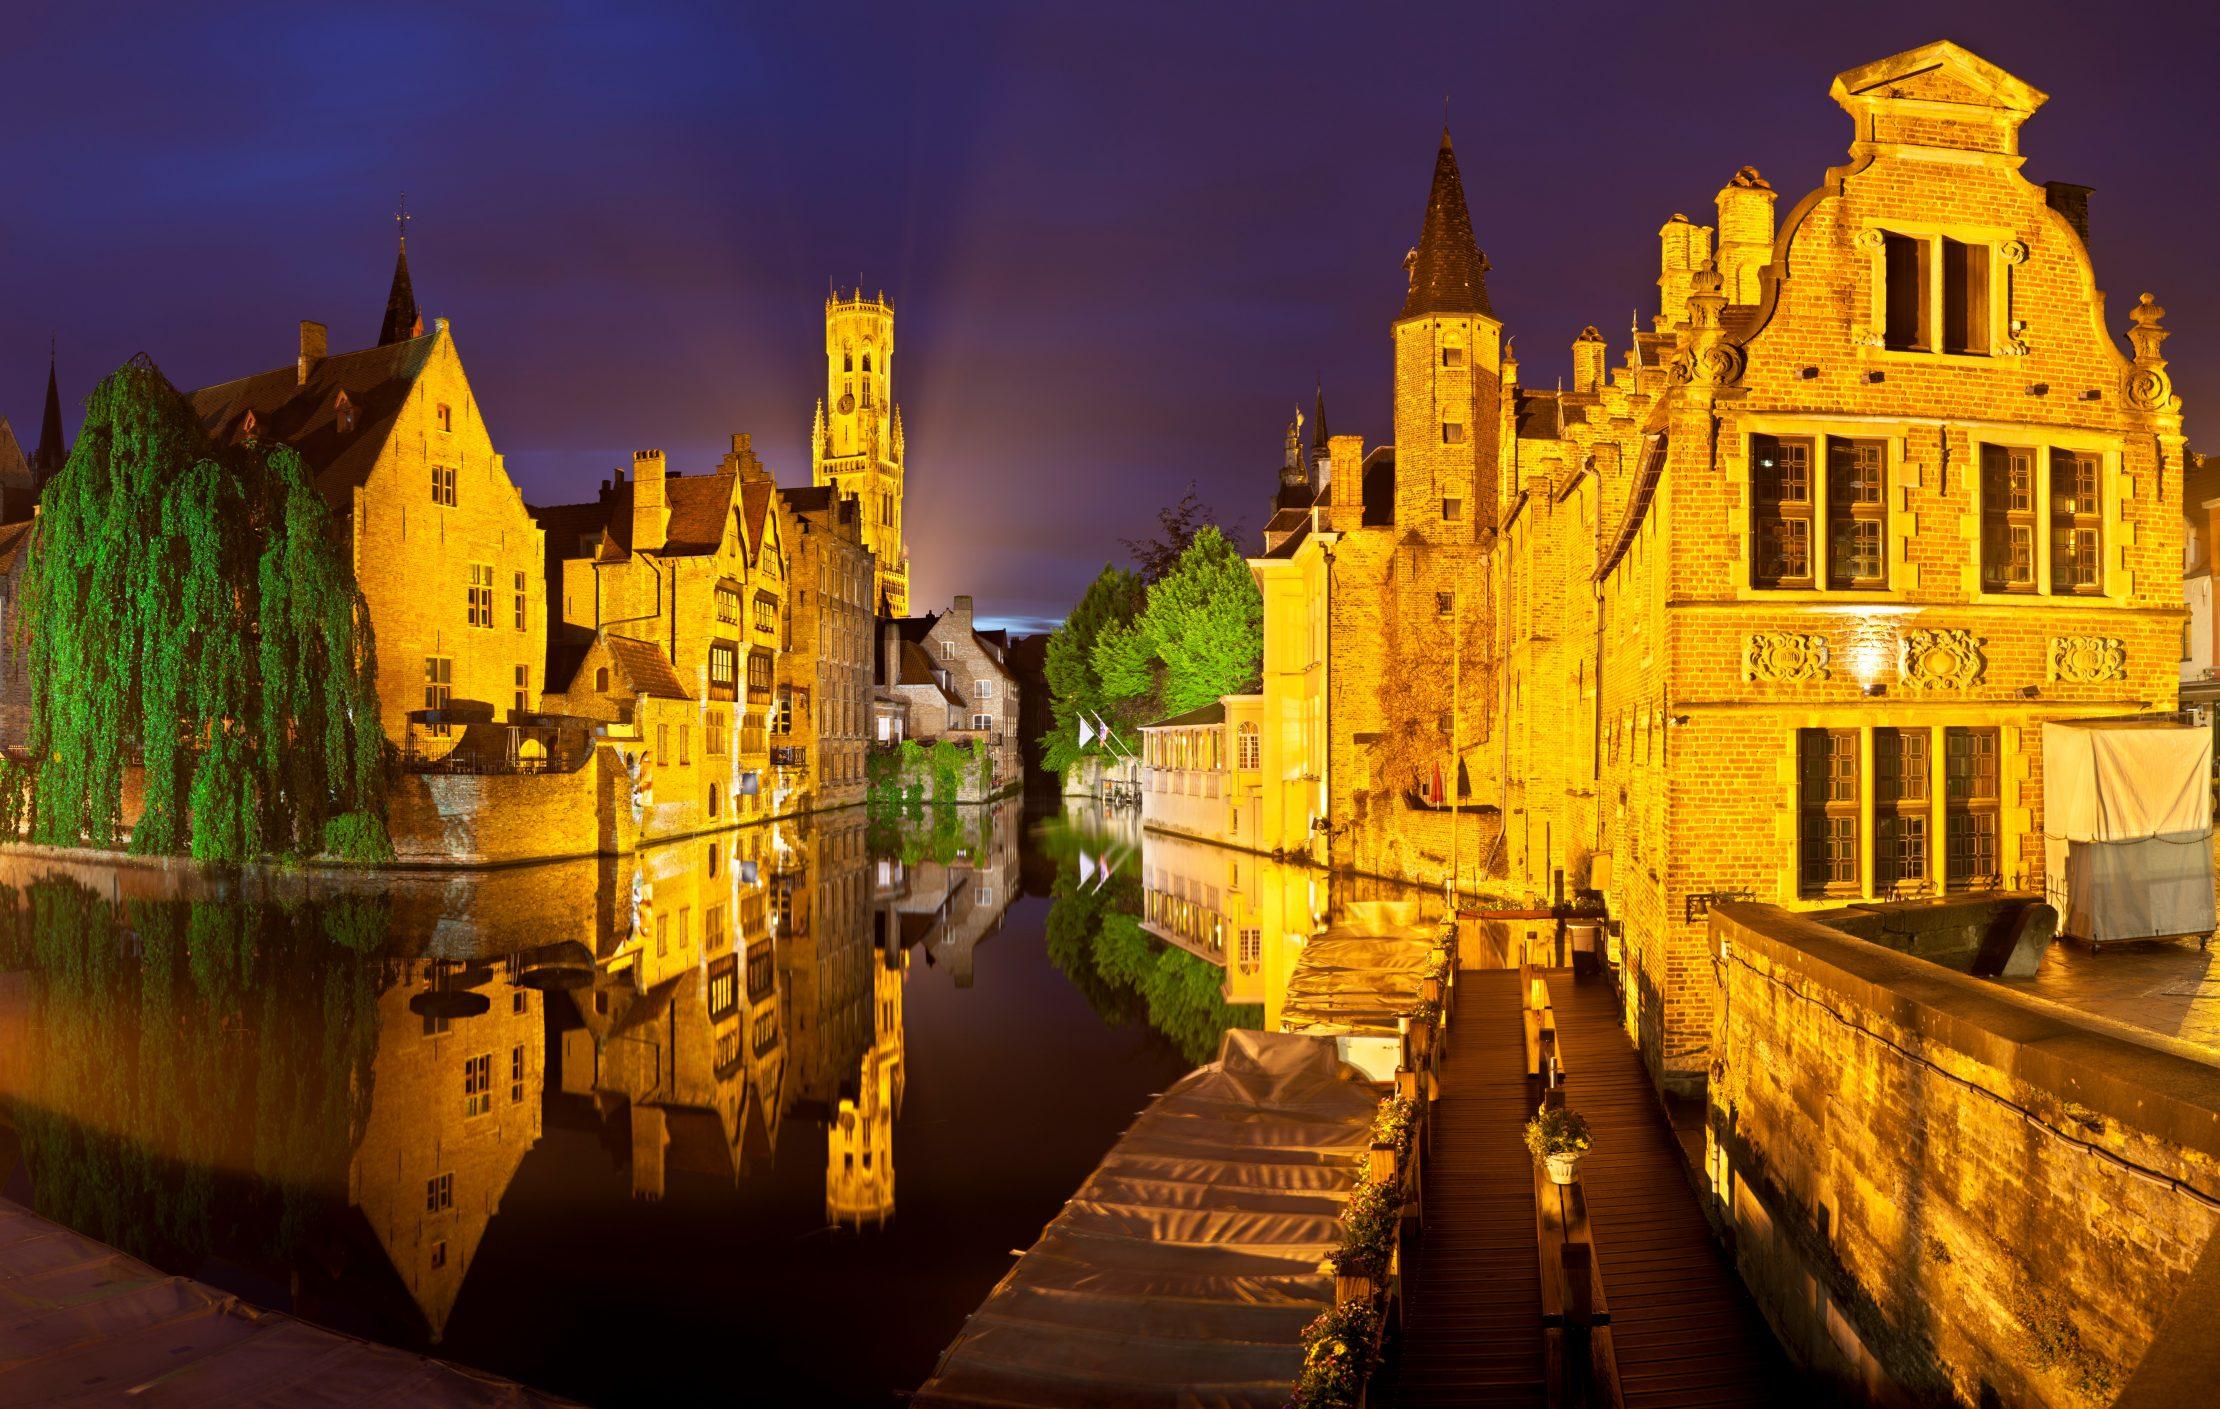 10 reasons to visit Bruges